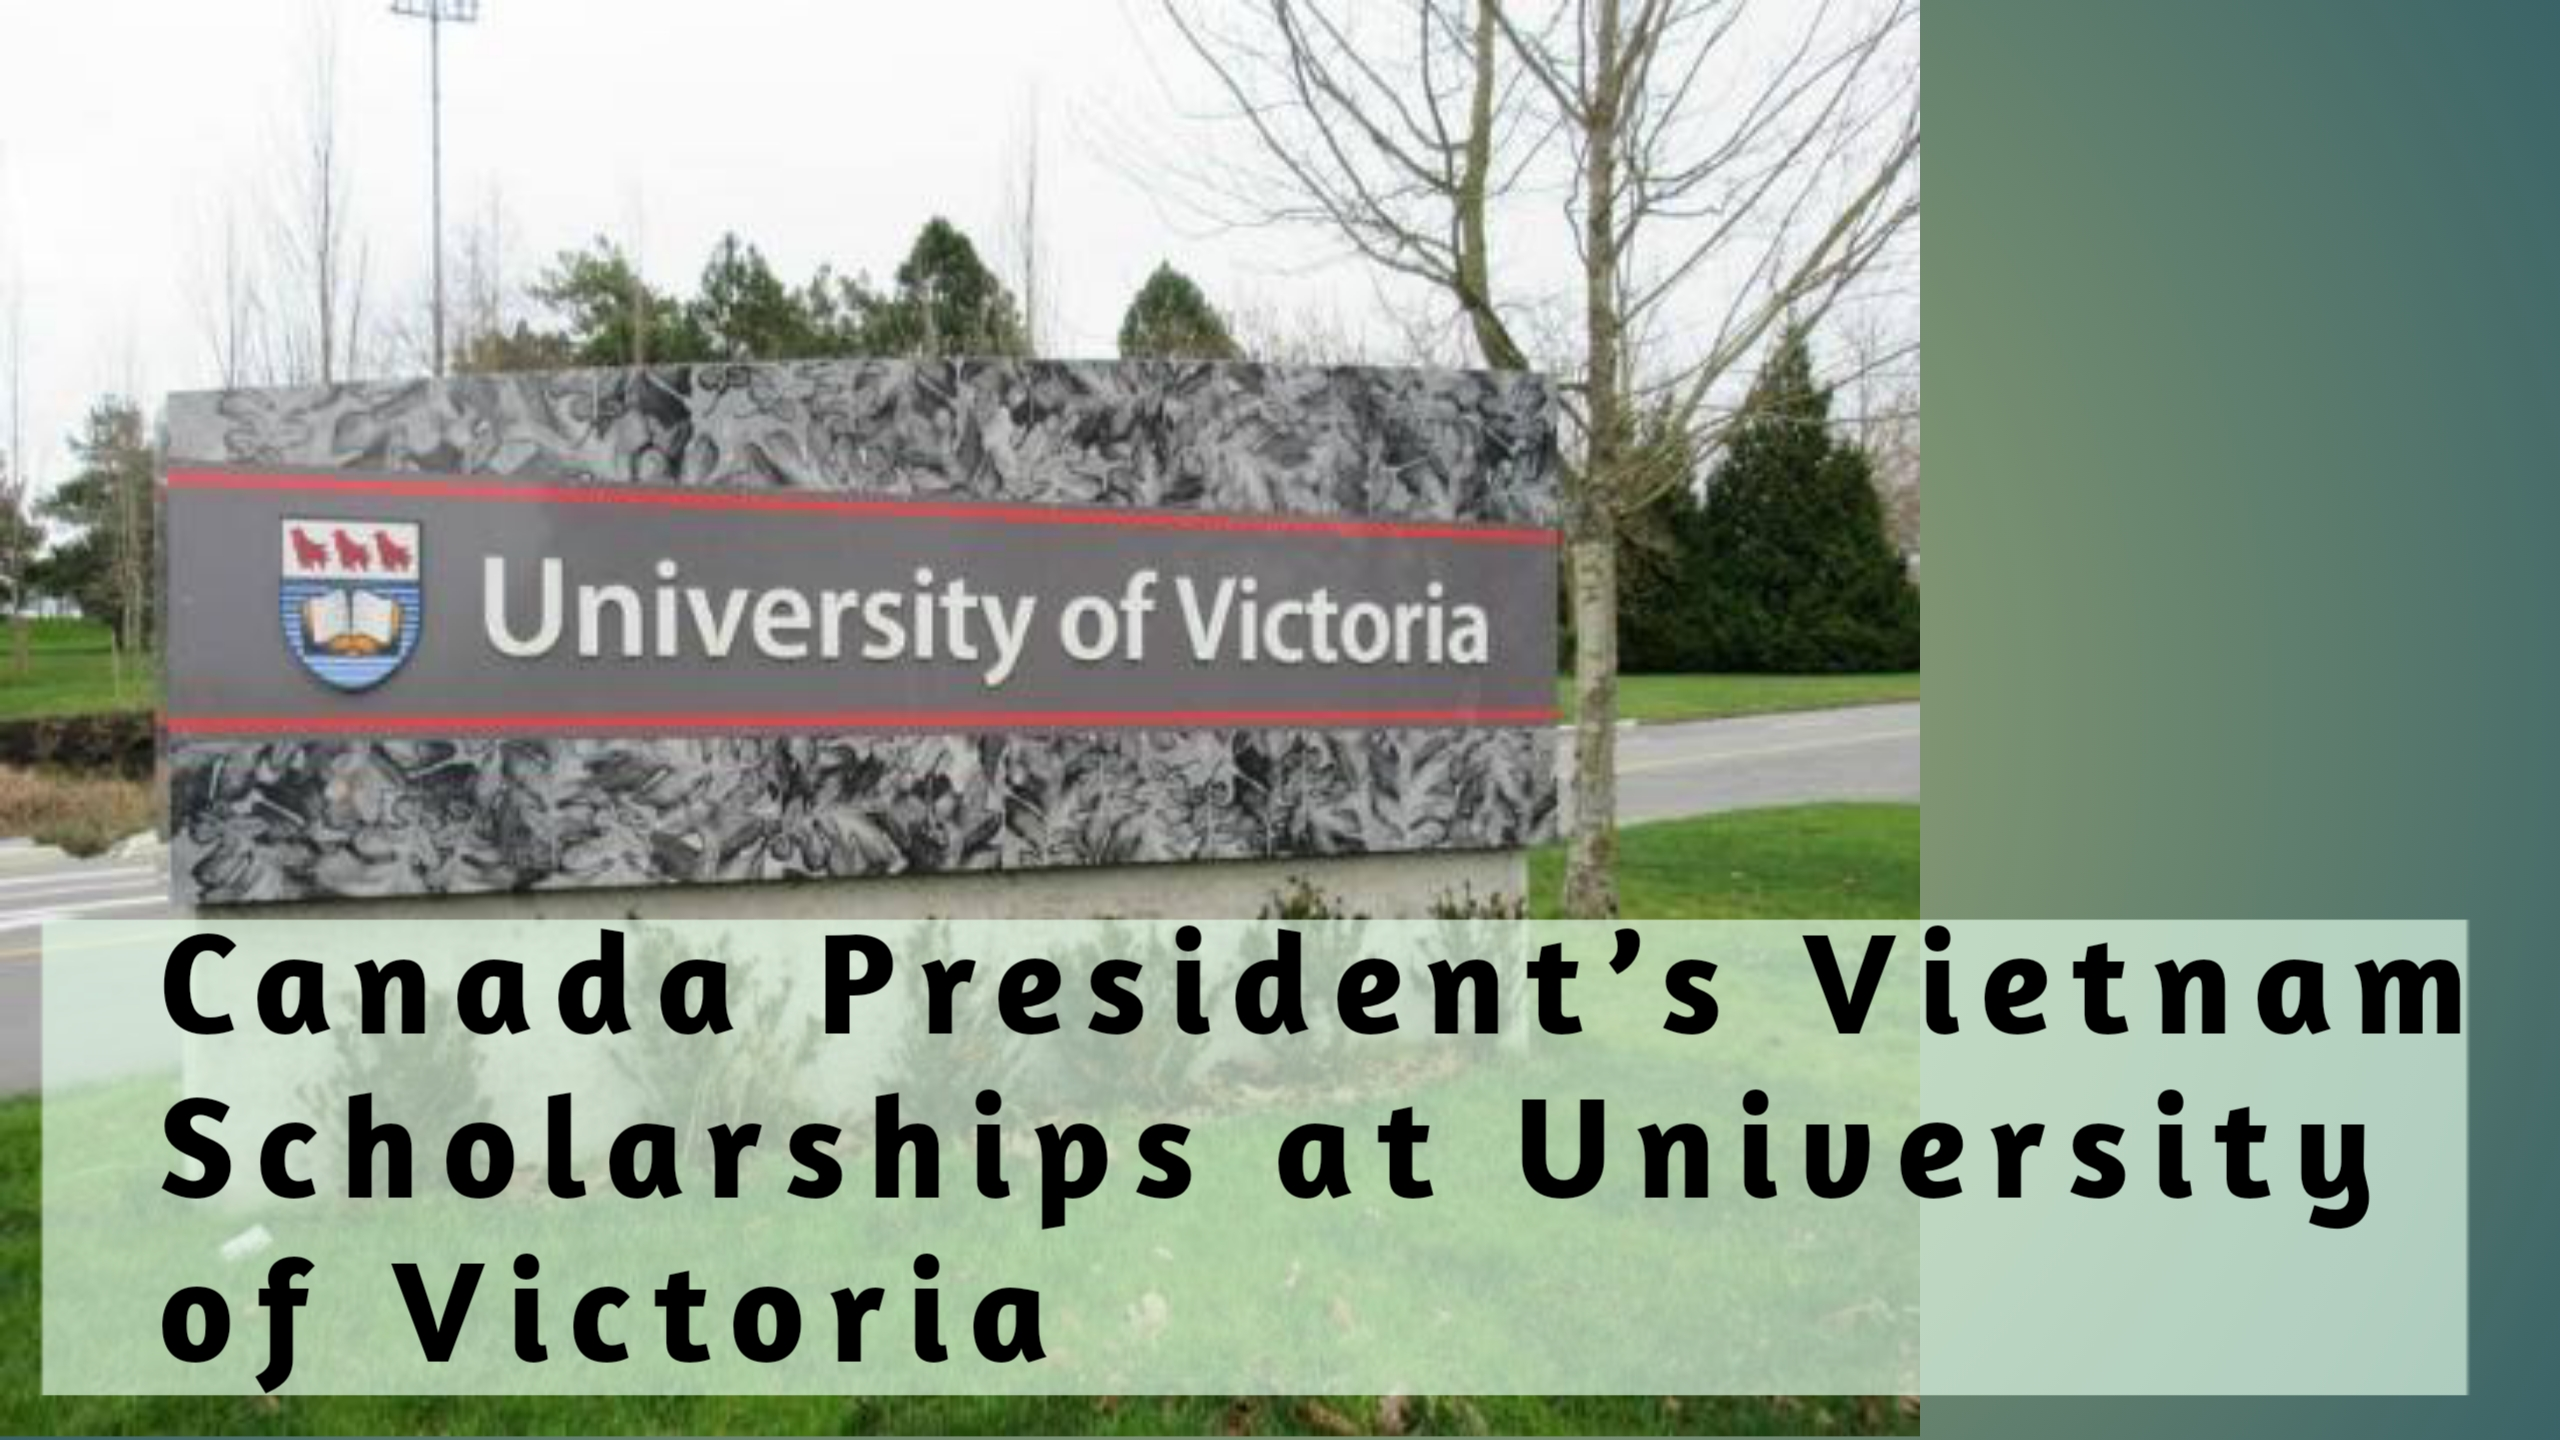 Canada President's Vietnam Scholarships at University of Victoria